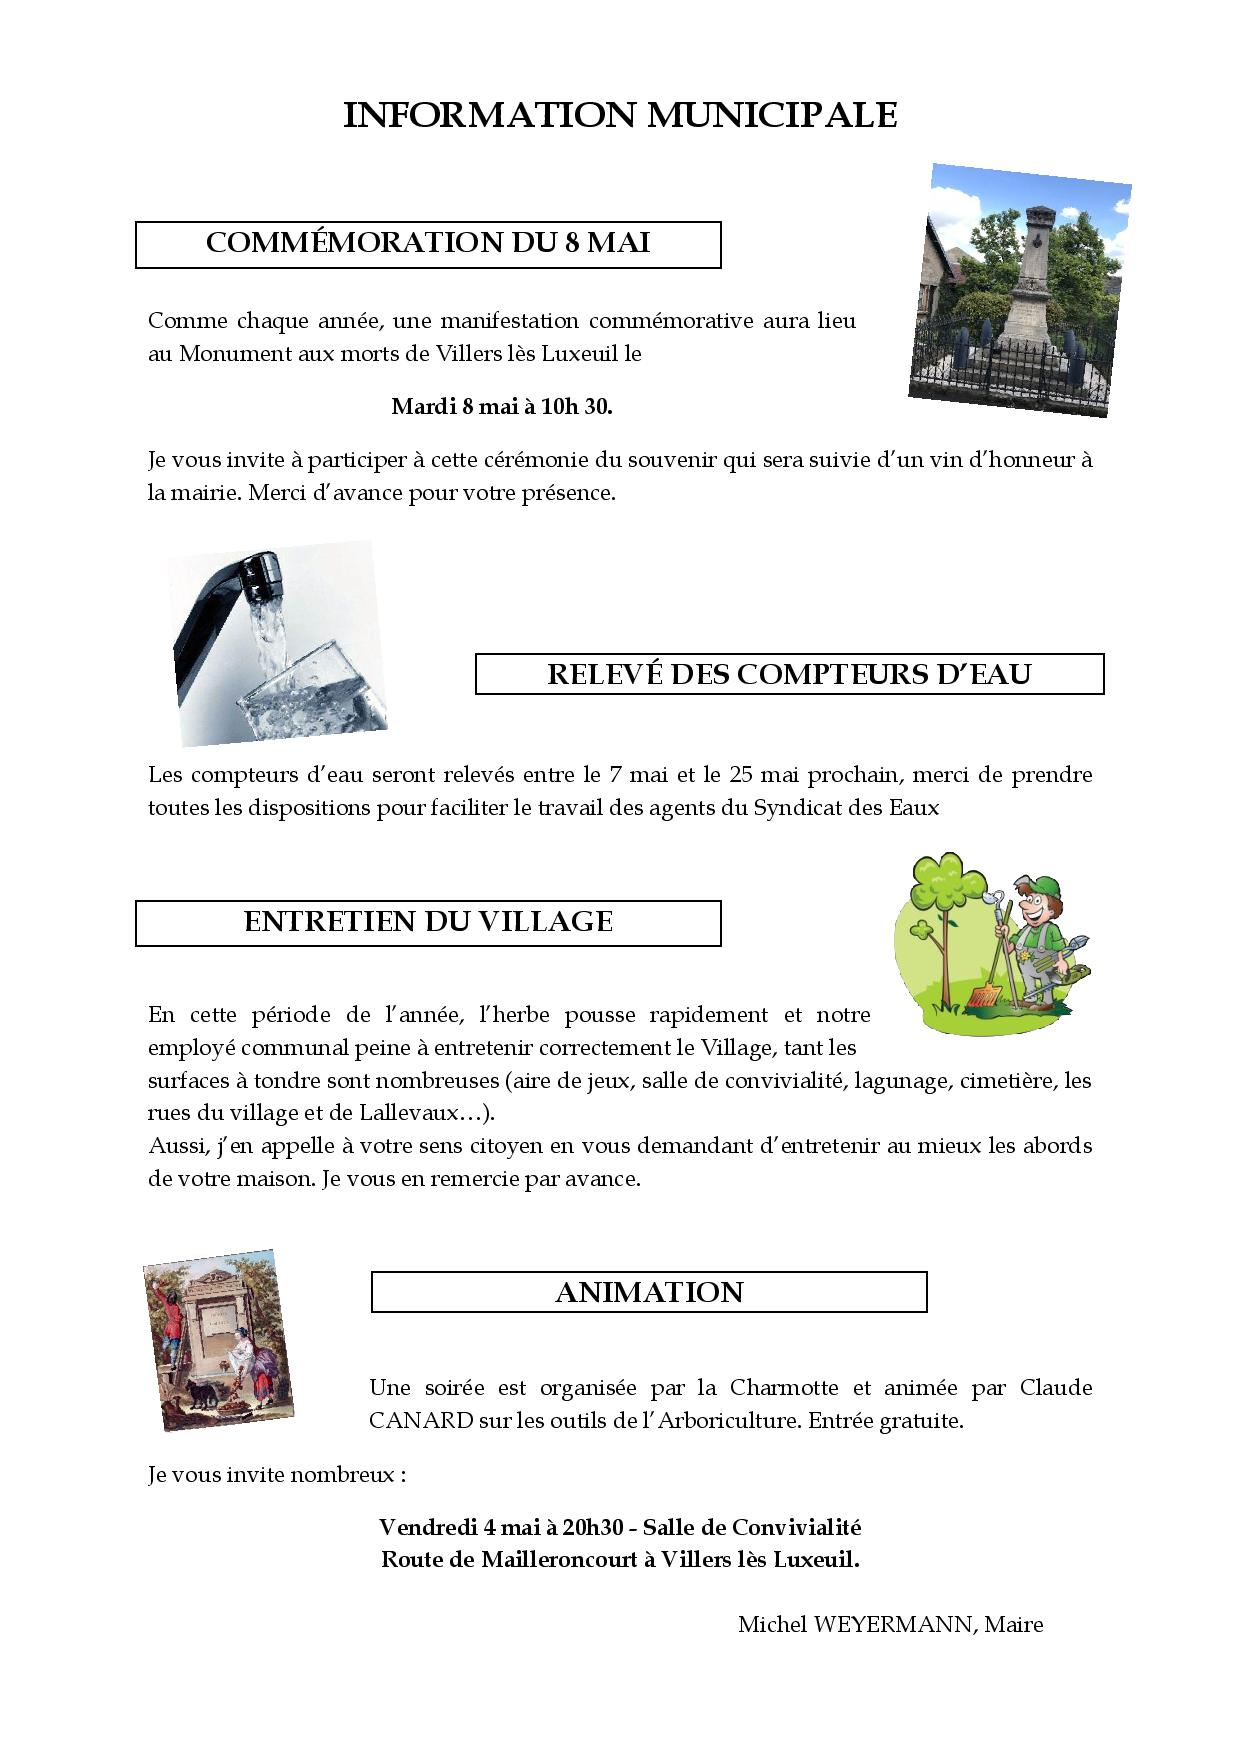 https://www.villers-les-luxeuil.com/projets/villers/files/images/2018_Mairie/Divers_pour_site/information_municipale_mai_2018.jpg